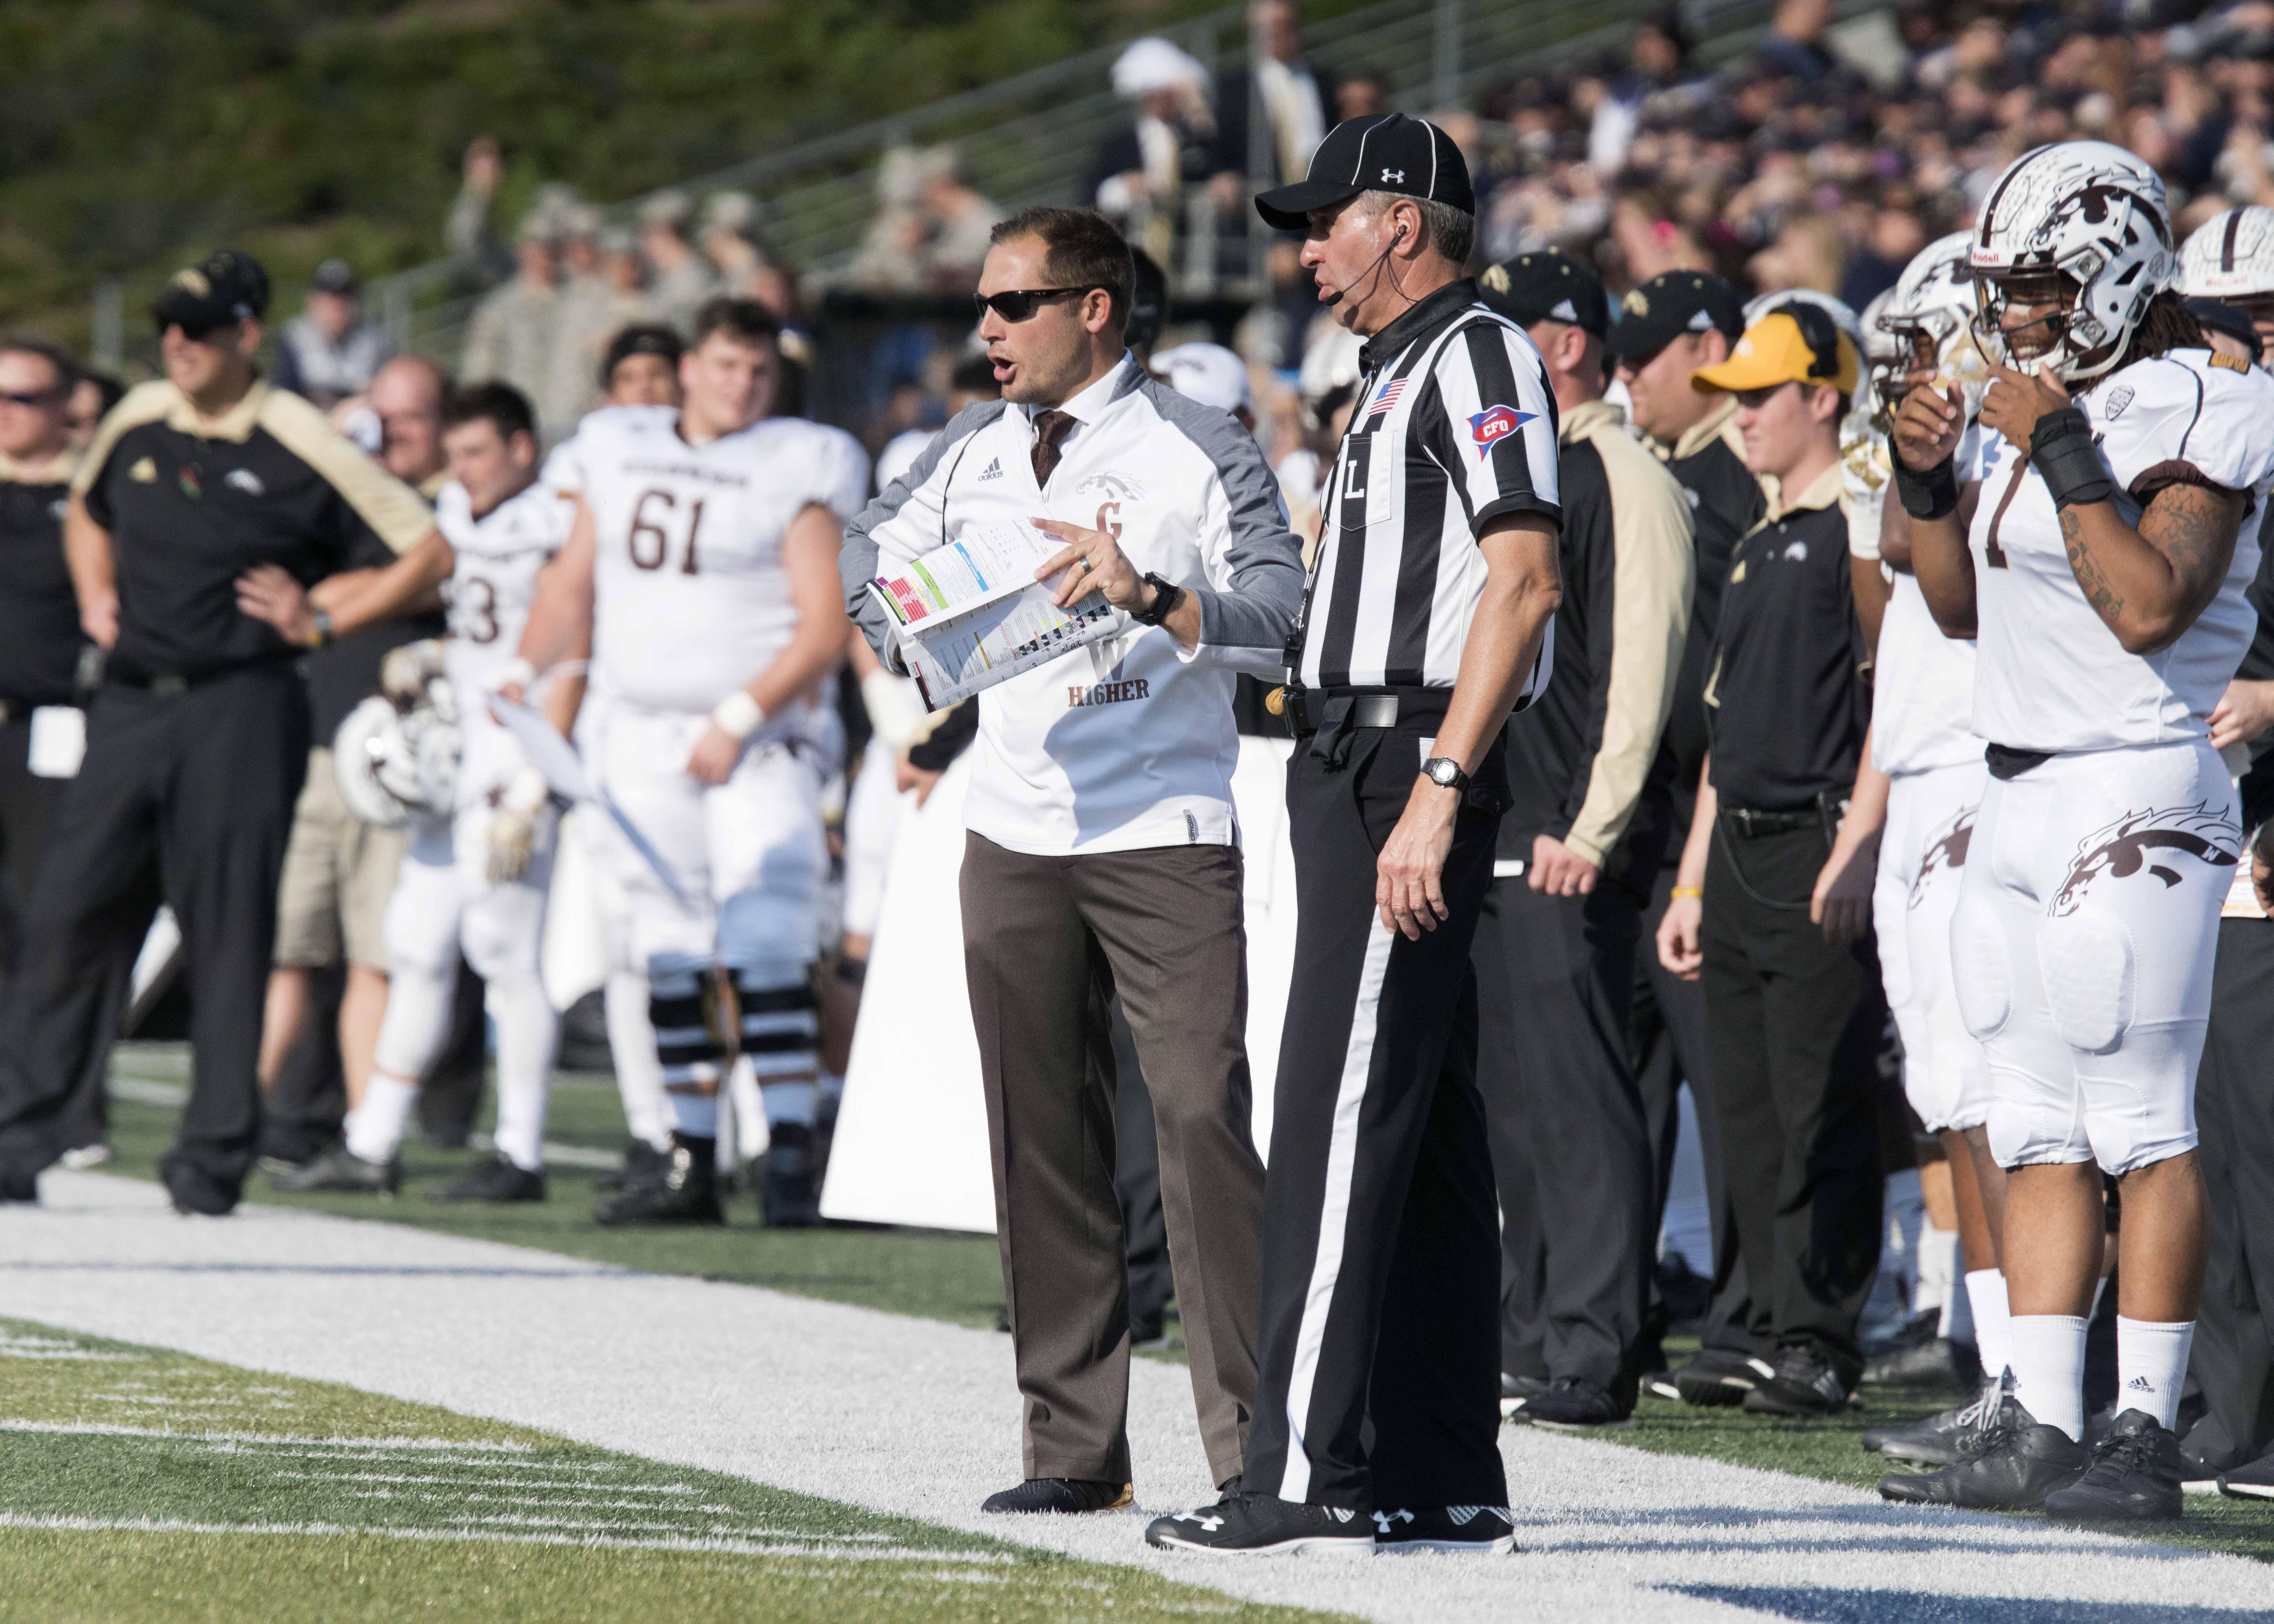 NCAA Football: Western Michigan at Akron